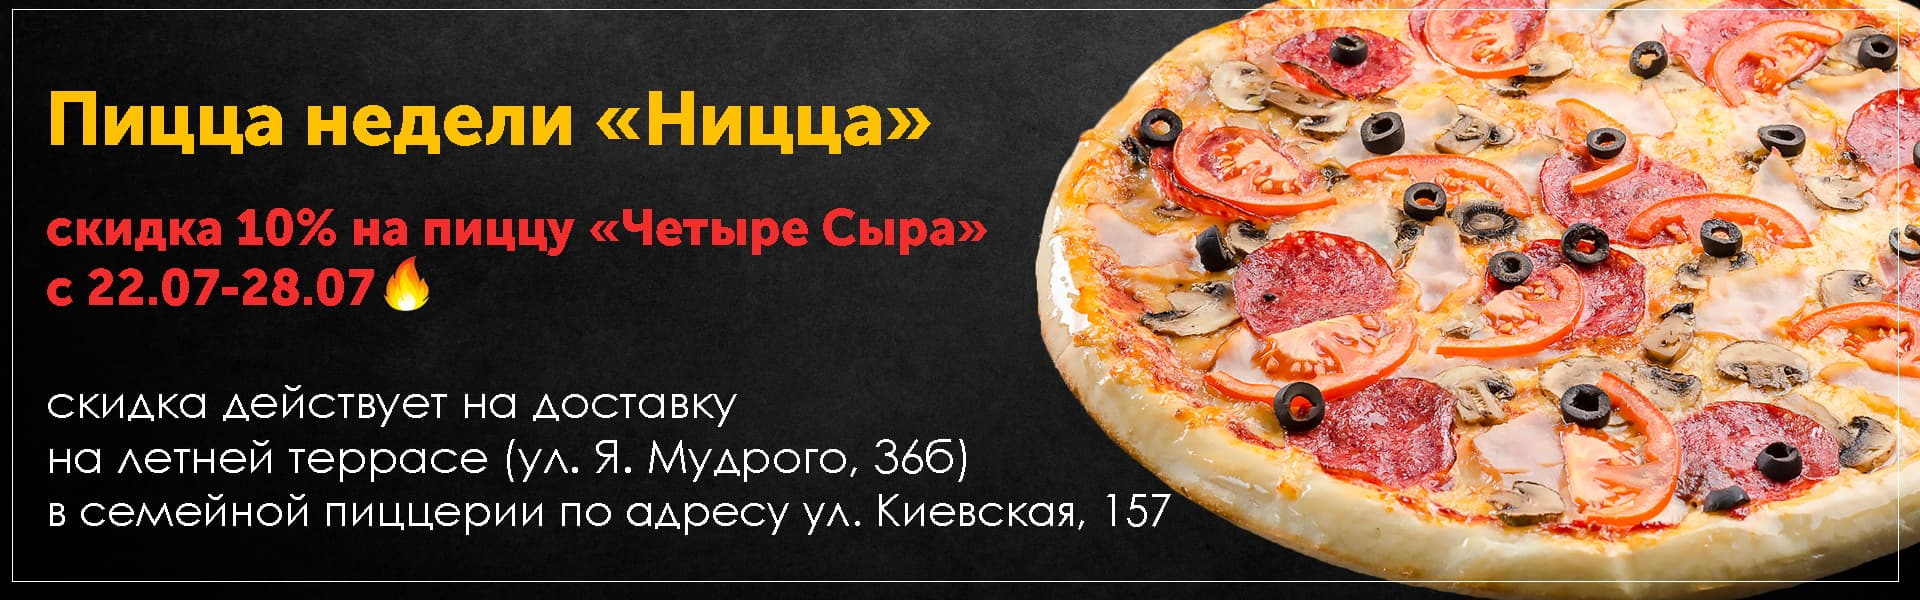 "Акция ""ПИЦЦА НЕДЕЛИ В БРОВАРАХ"" - НИЦЦА! С 22.07-28.07"